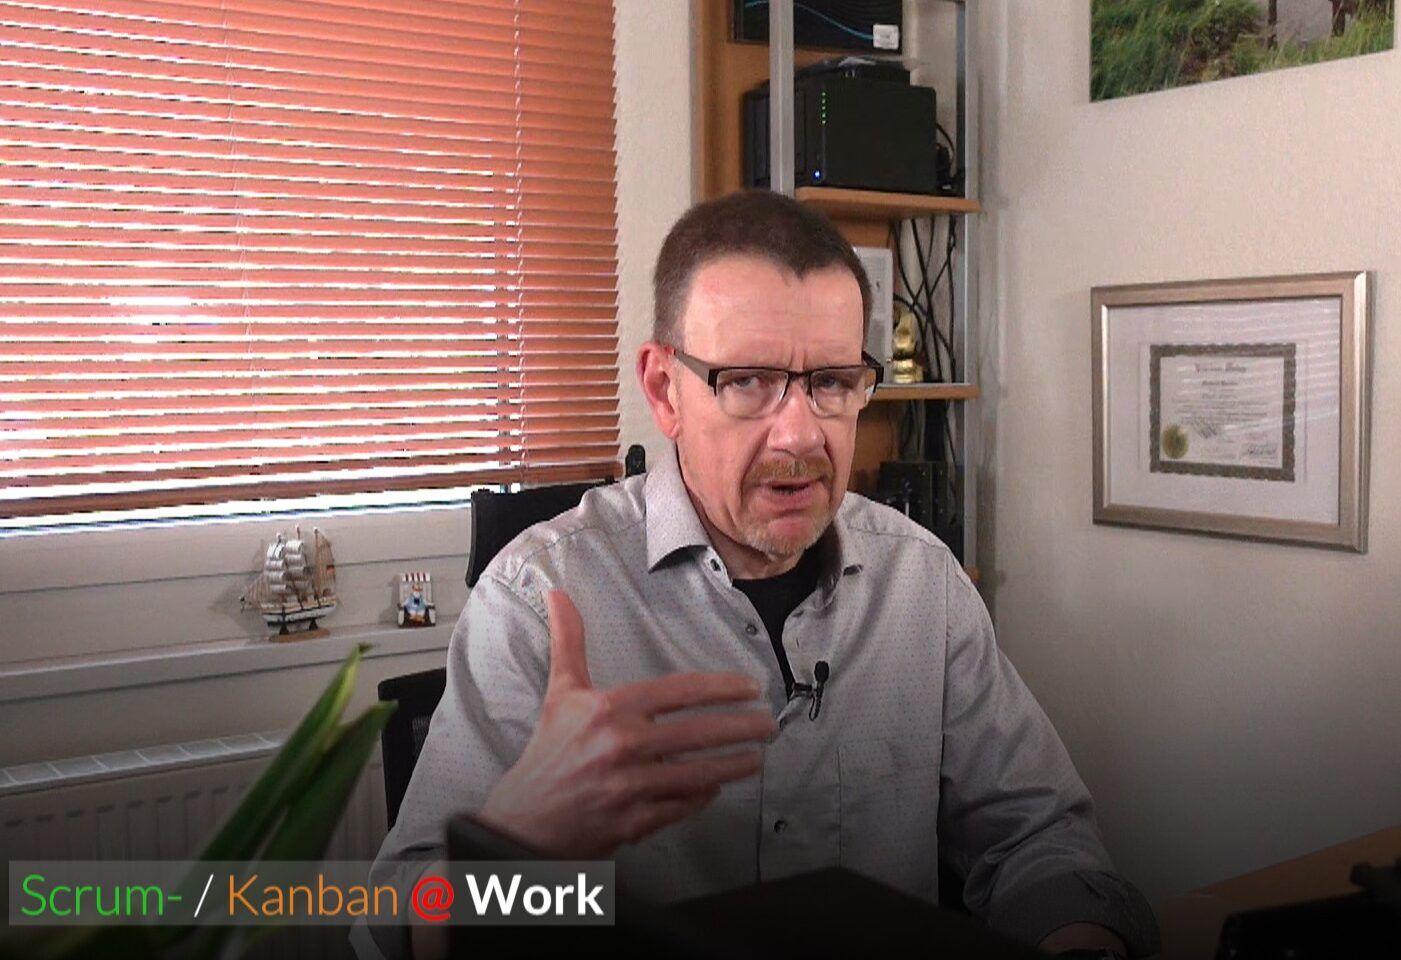 Scrum- / Kanman @ Work, Scrum, Kanban Agile agile Alternative mit eigener Methode